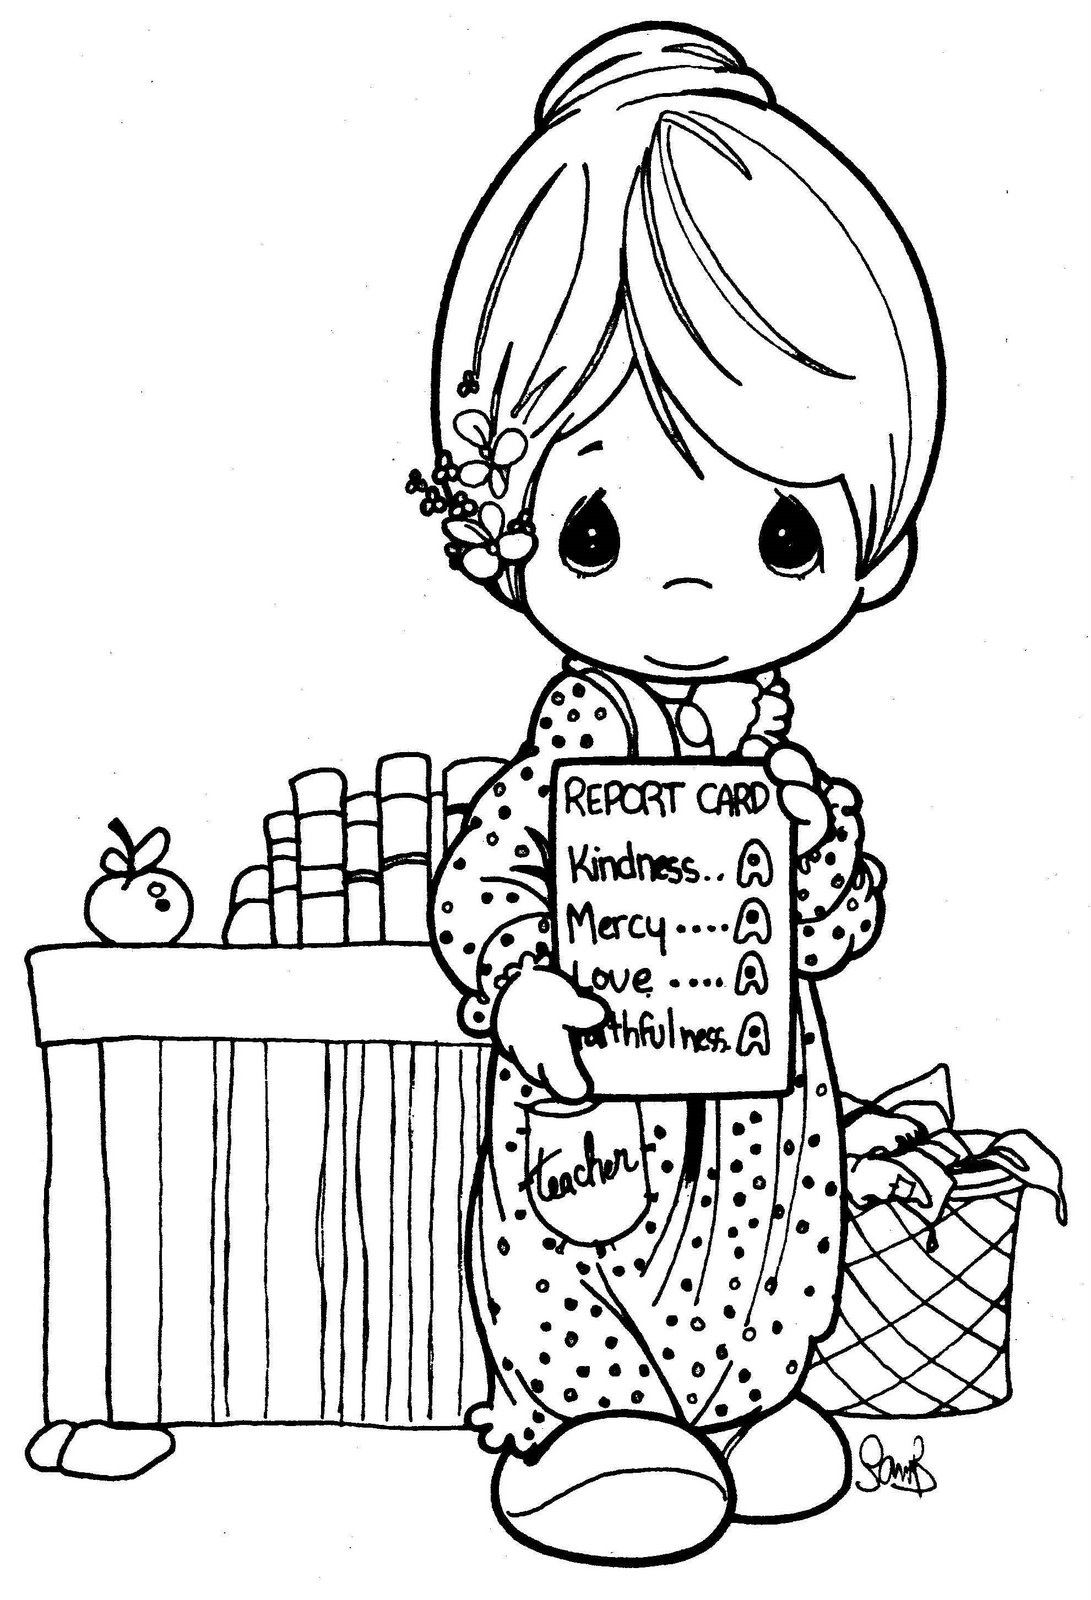 Lujo Preciosos Momentos Para Colorear Libros Adorno - Dibujos Para ...